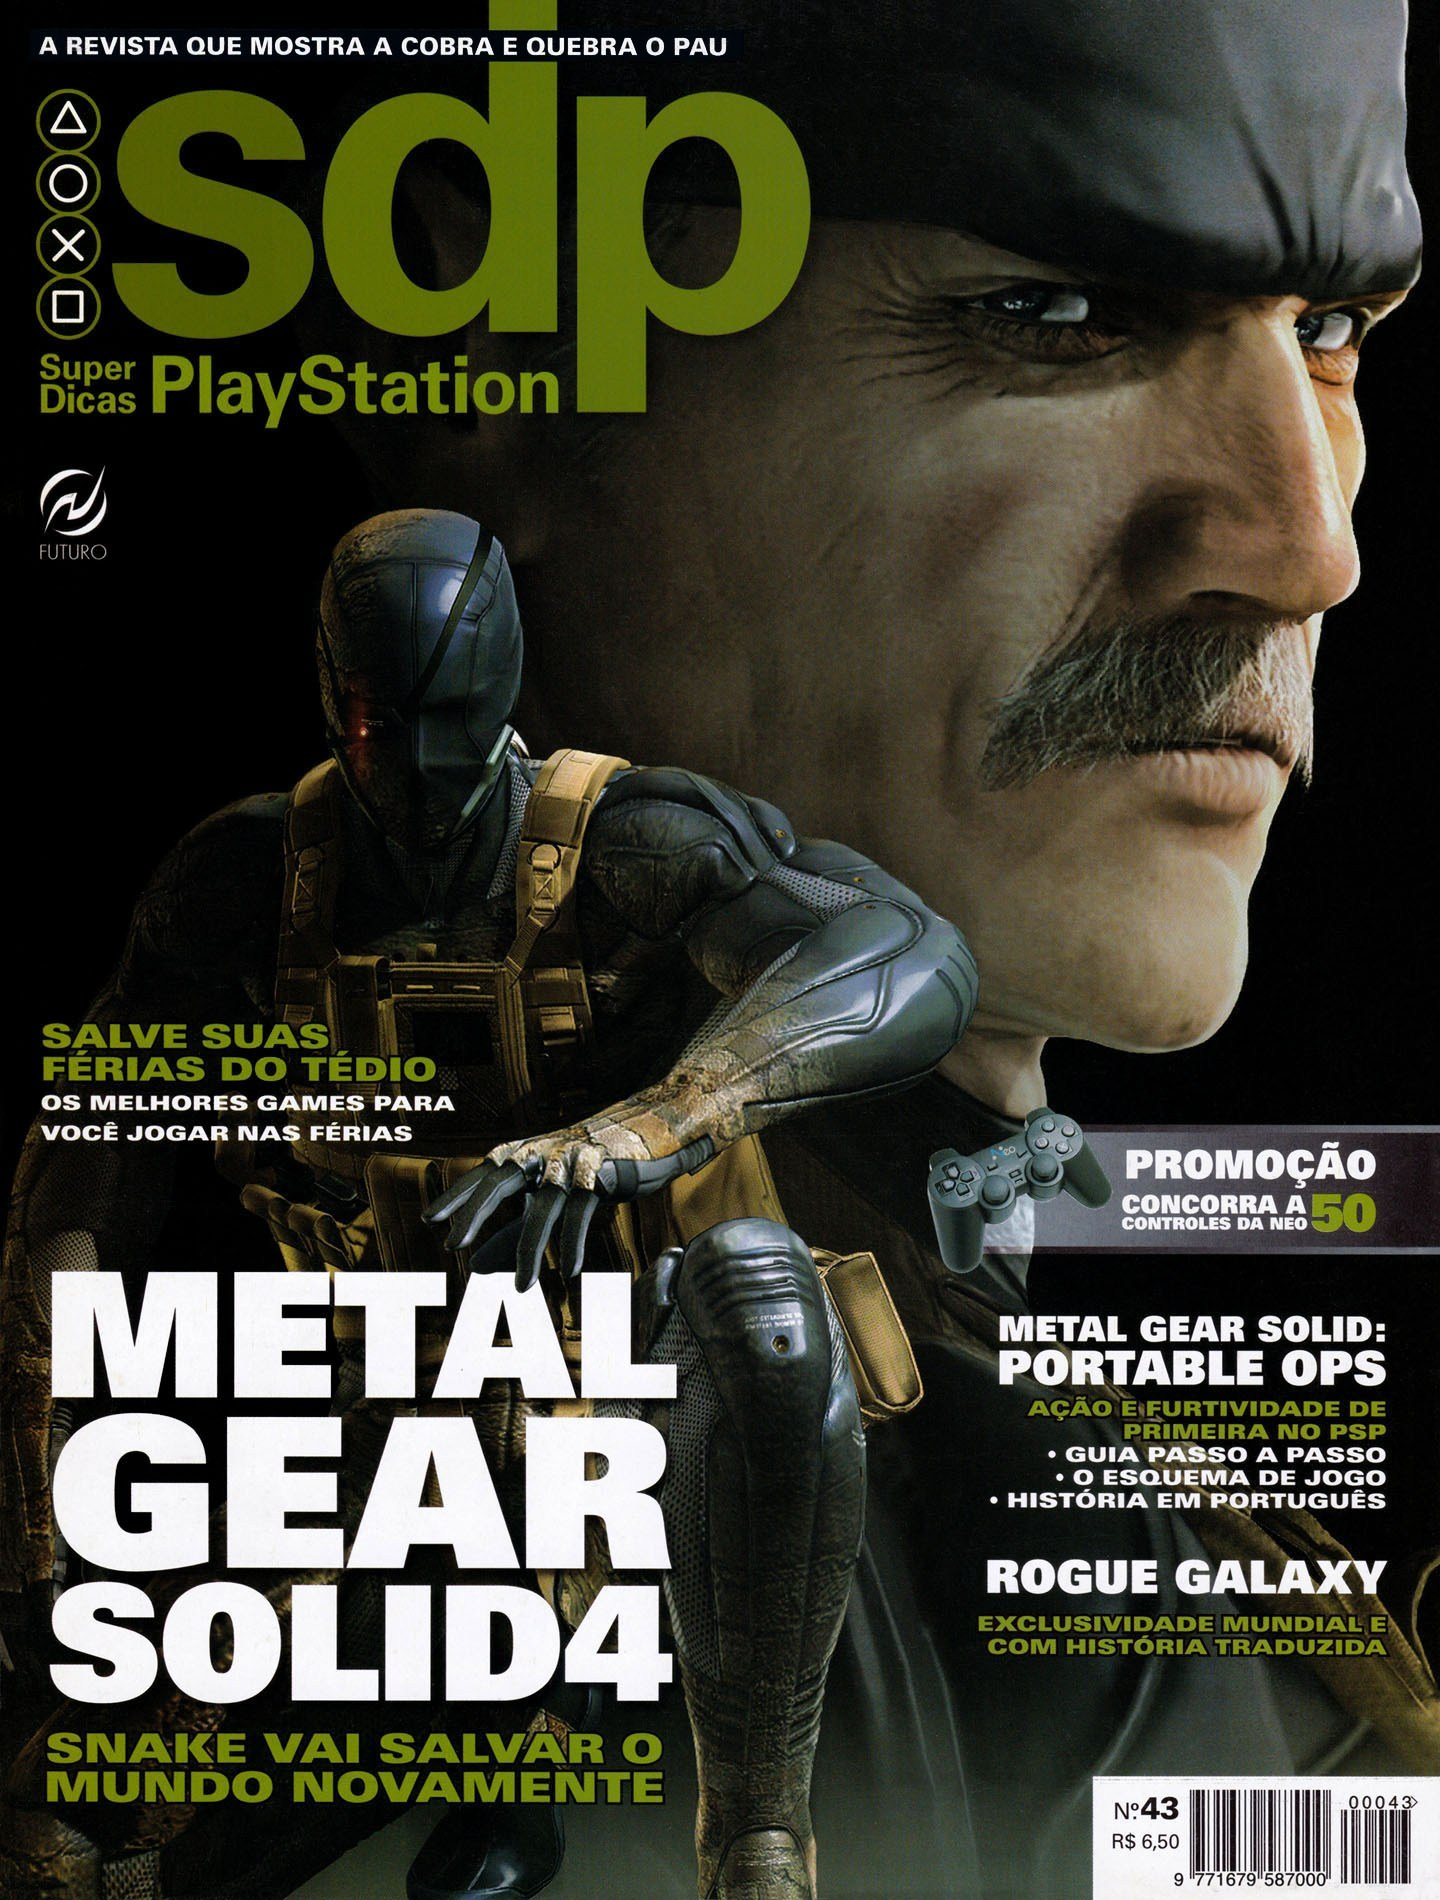 Super Dicas Playstation 43 (February 2007)